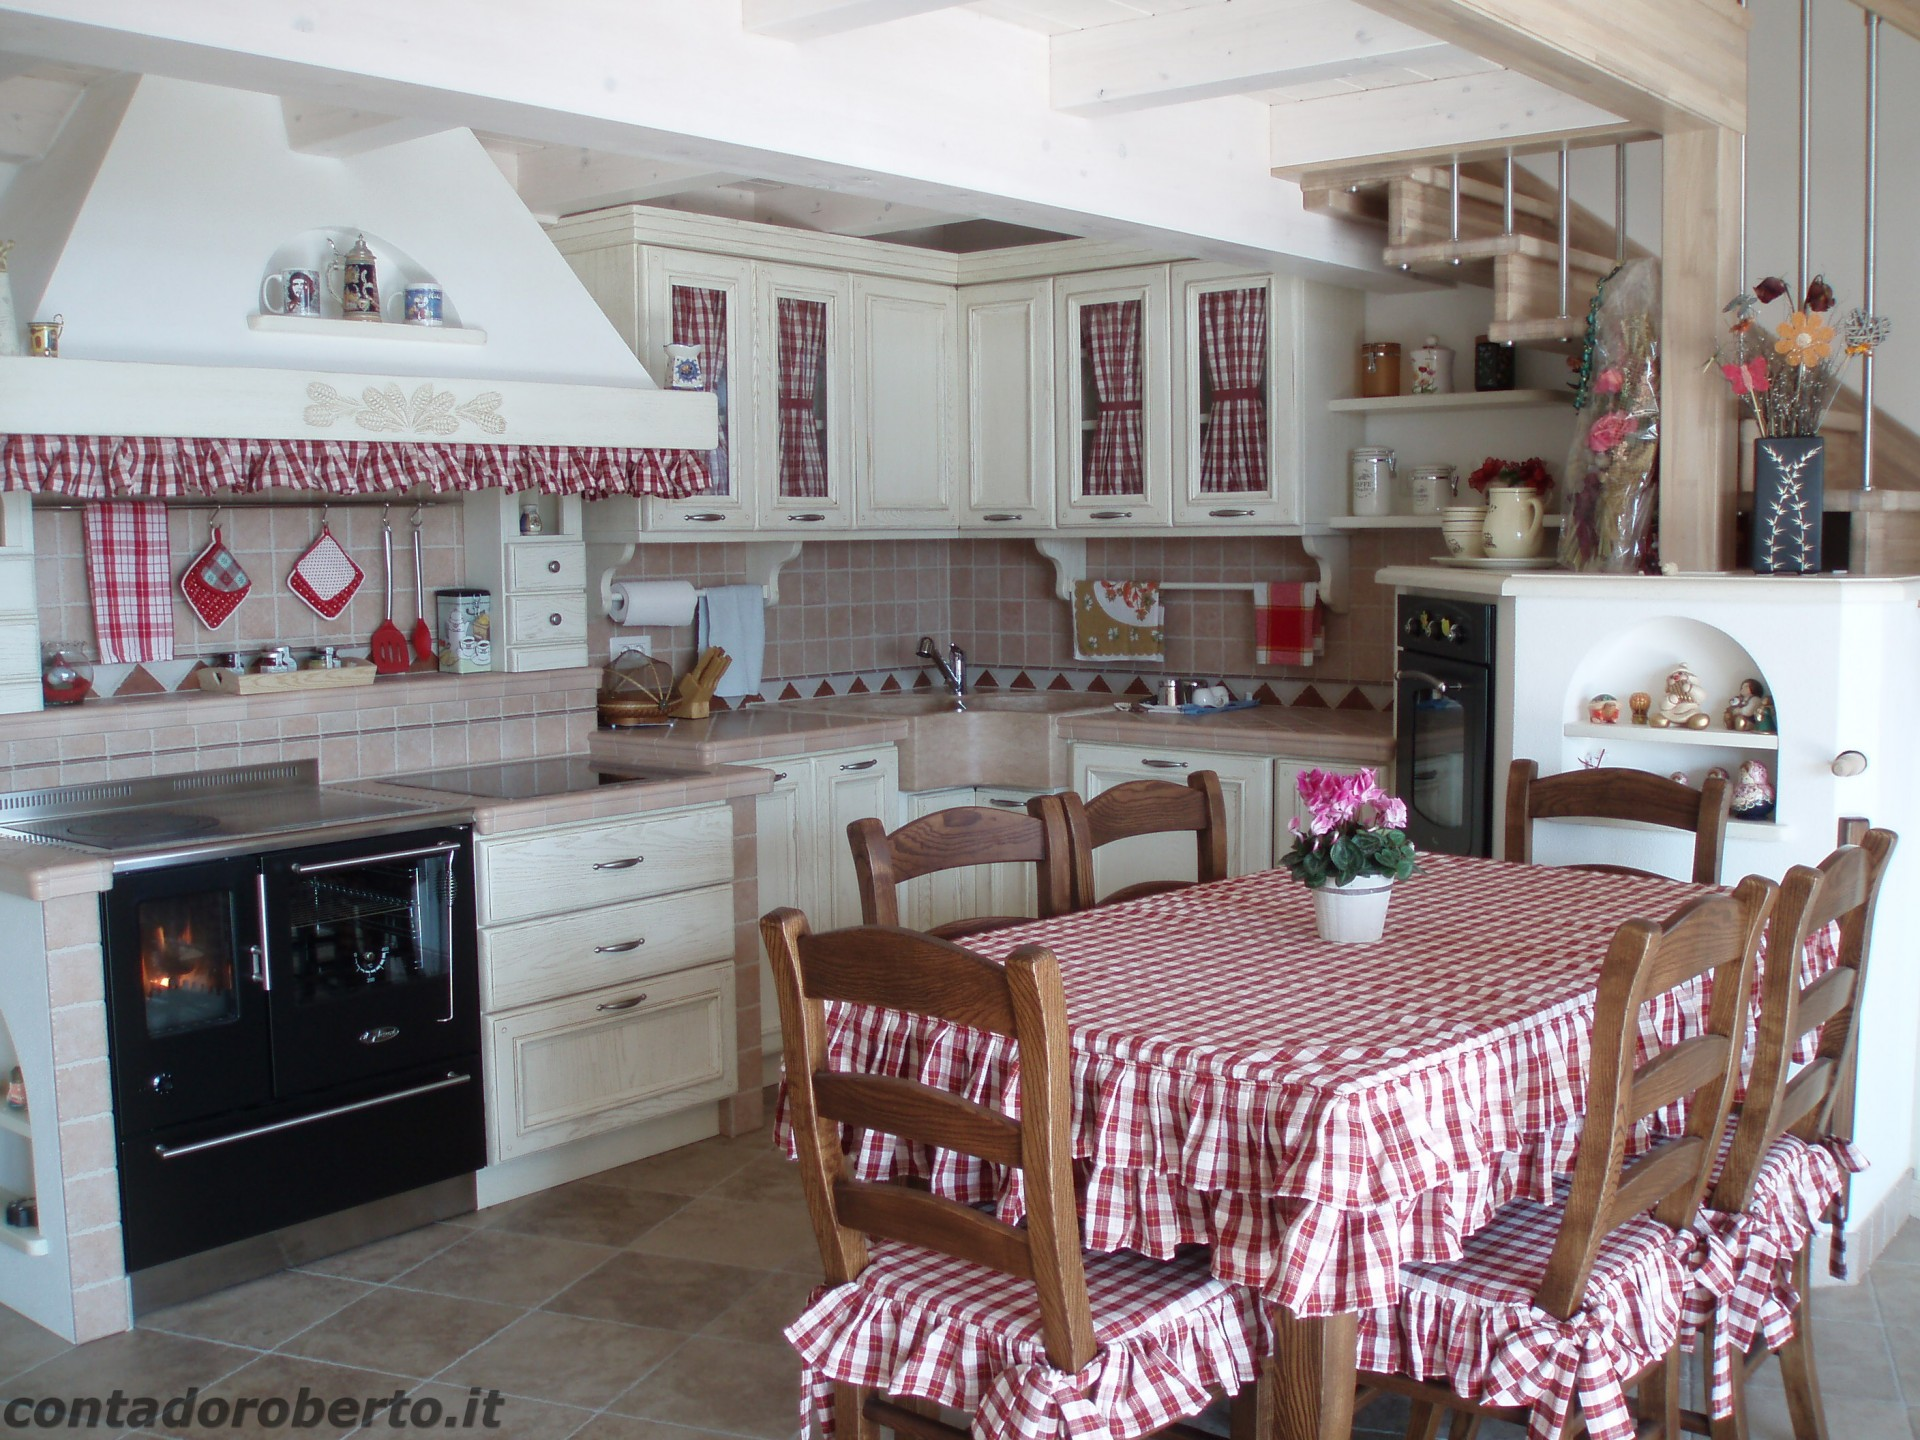 Forno Cucina In Muratura cucina in muratura sotto soppalco | contado roberto group